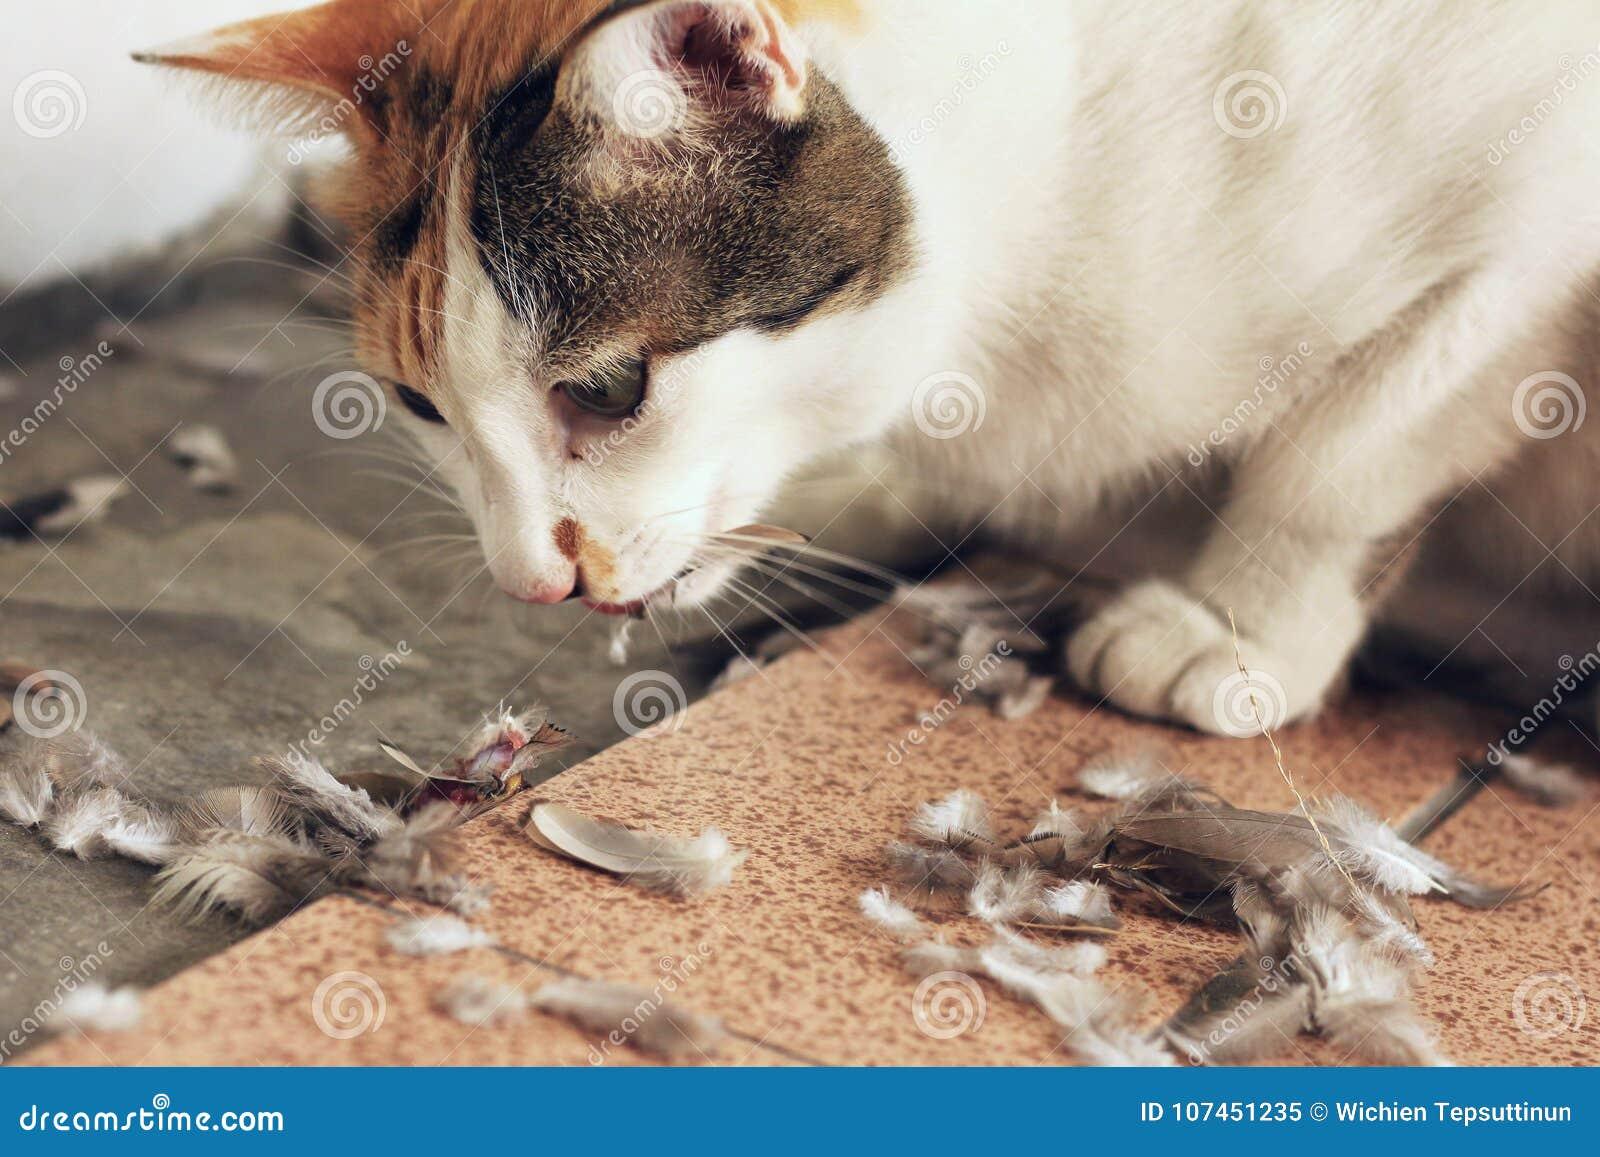 Cat Eating Bird Hunting Instinct-Concept